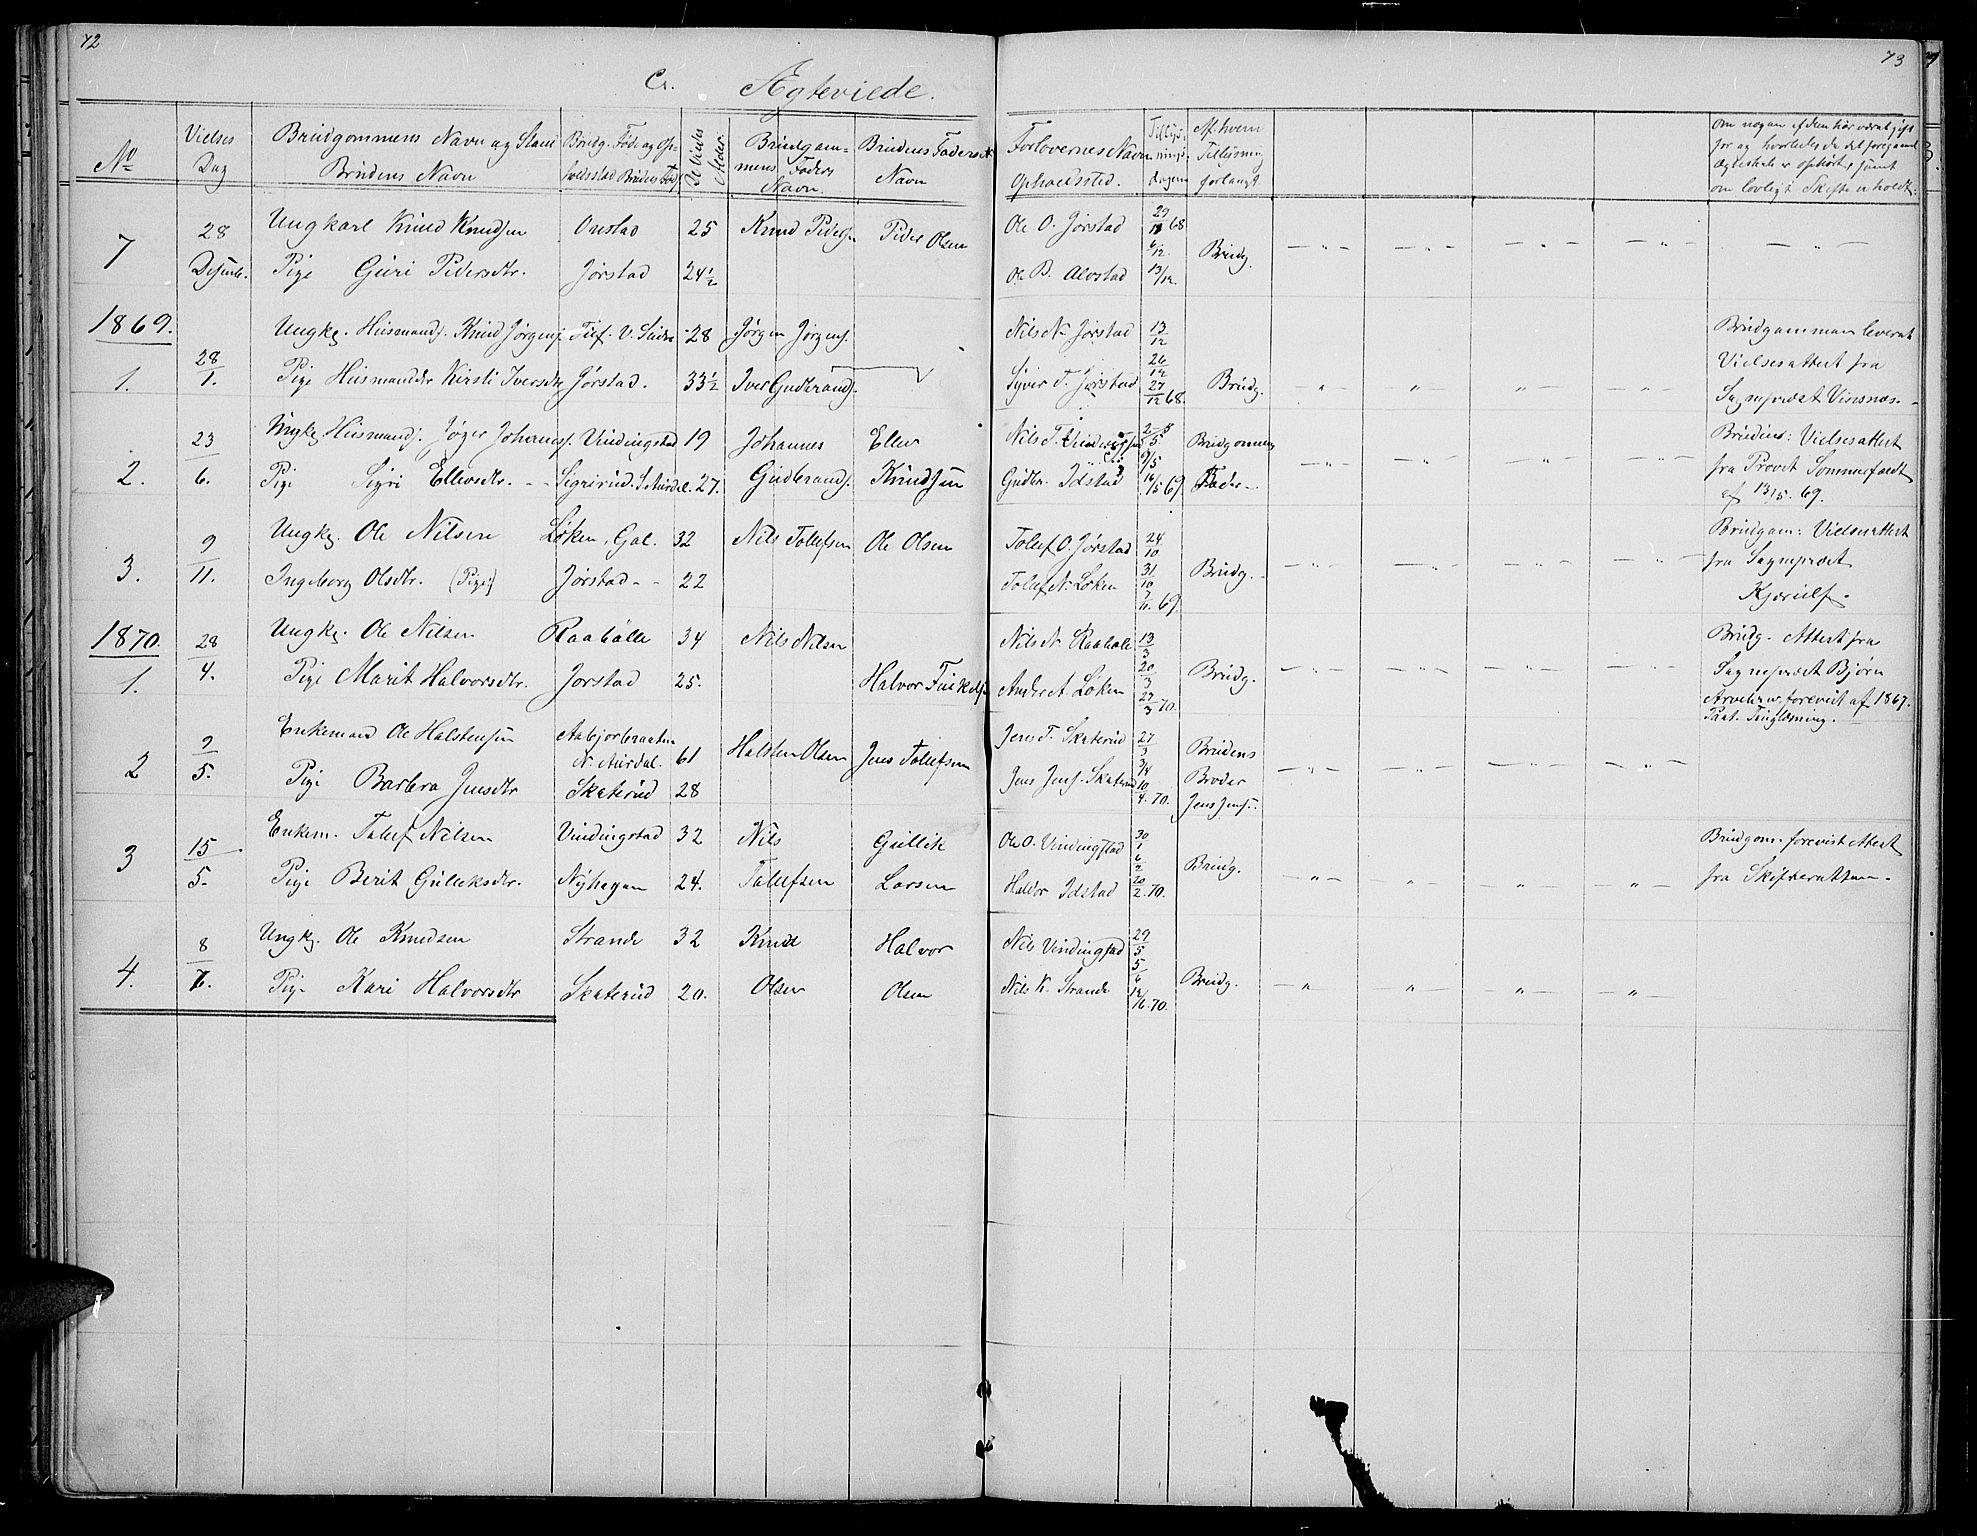 SAH, Øystre Slidre prestekontor, Klokkerbok nr. 2, 1866-1886, s. 72-73